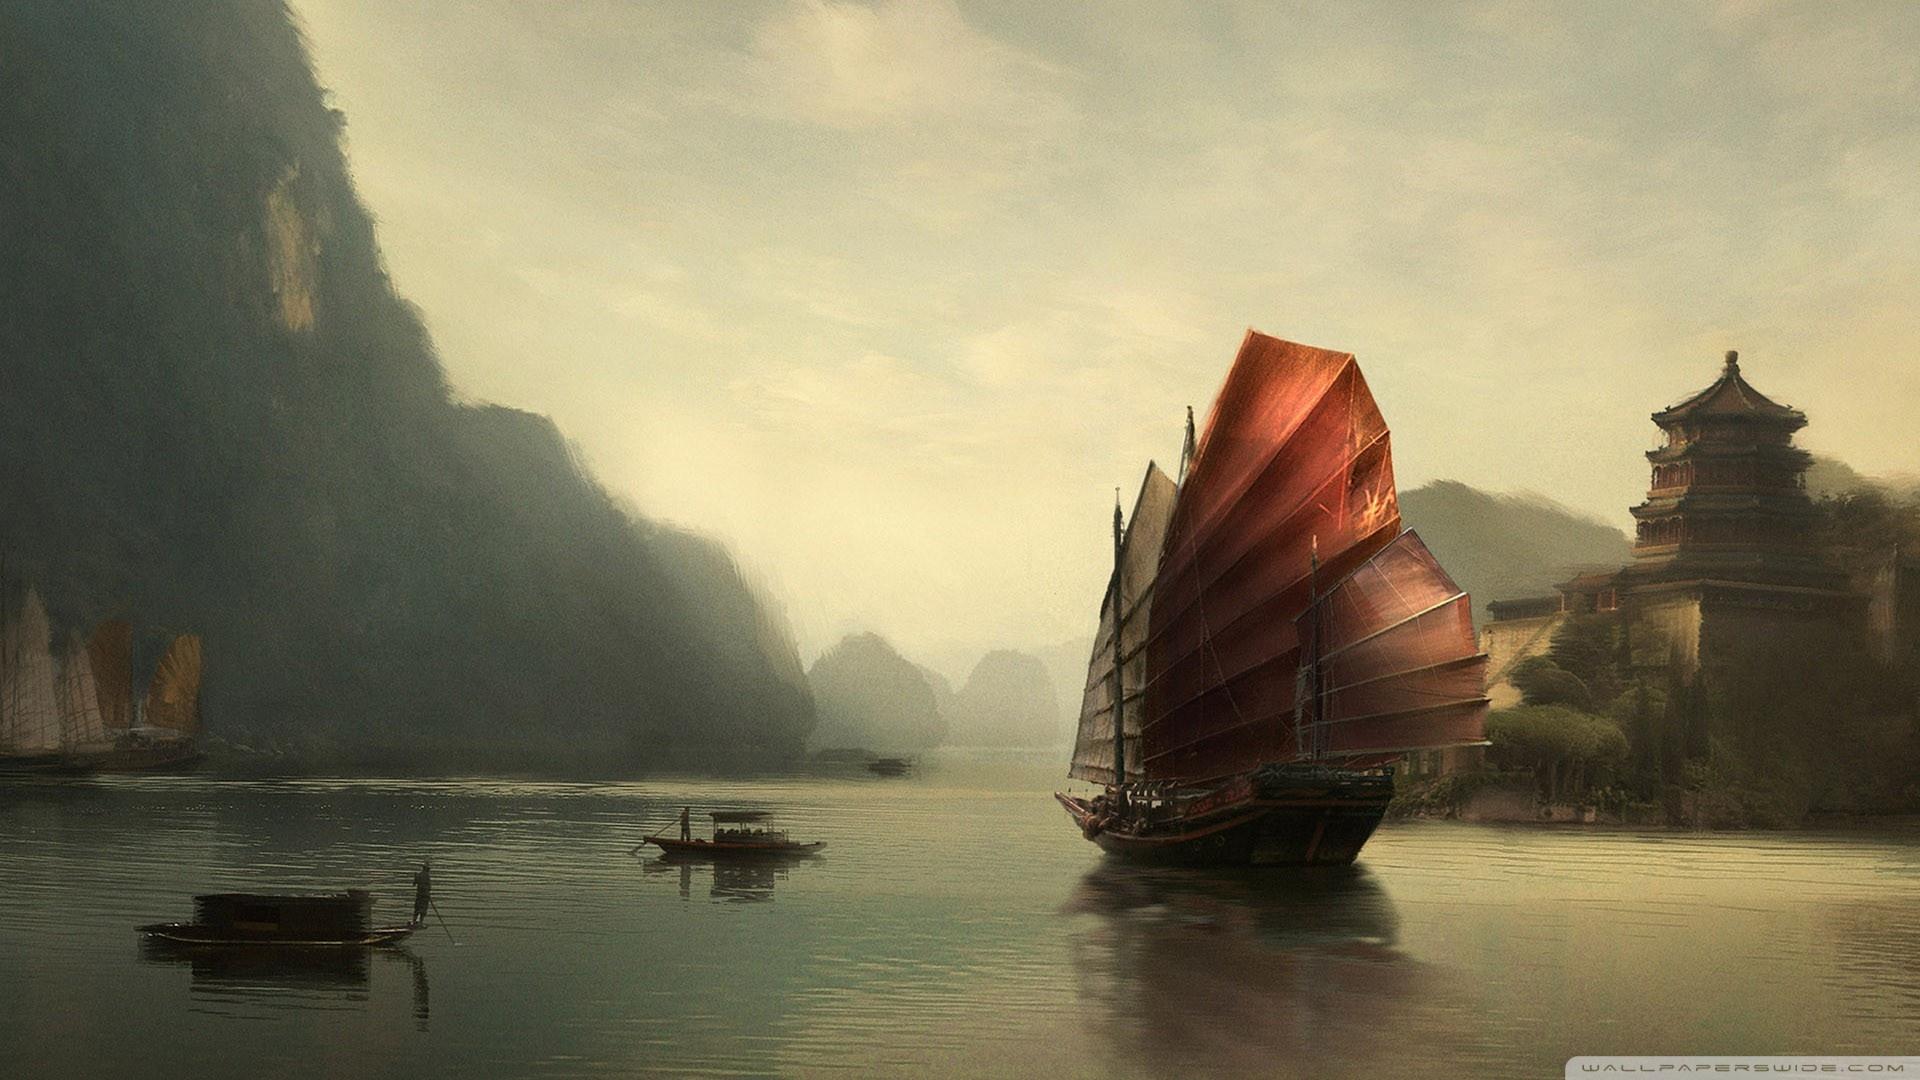 Junk Ship Chinese Painting 4K HD Desktop Wallpaper for 4K Ultra 1920x1080